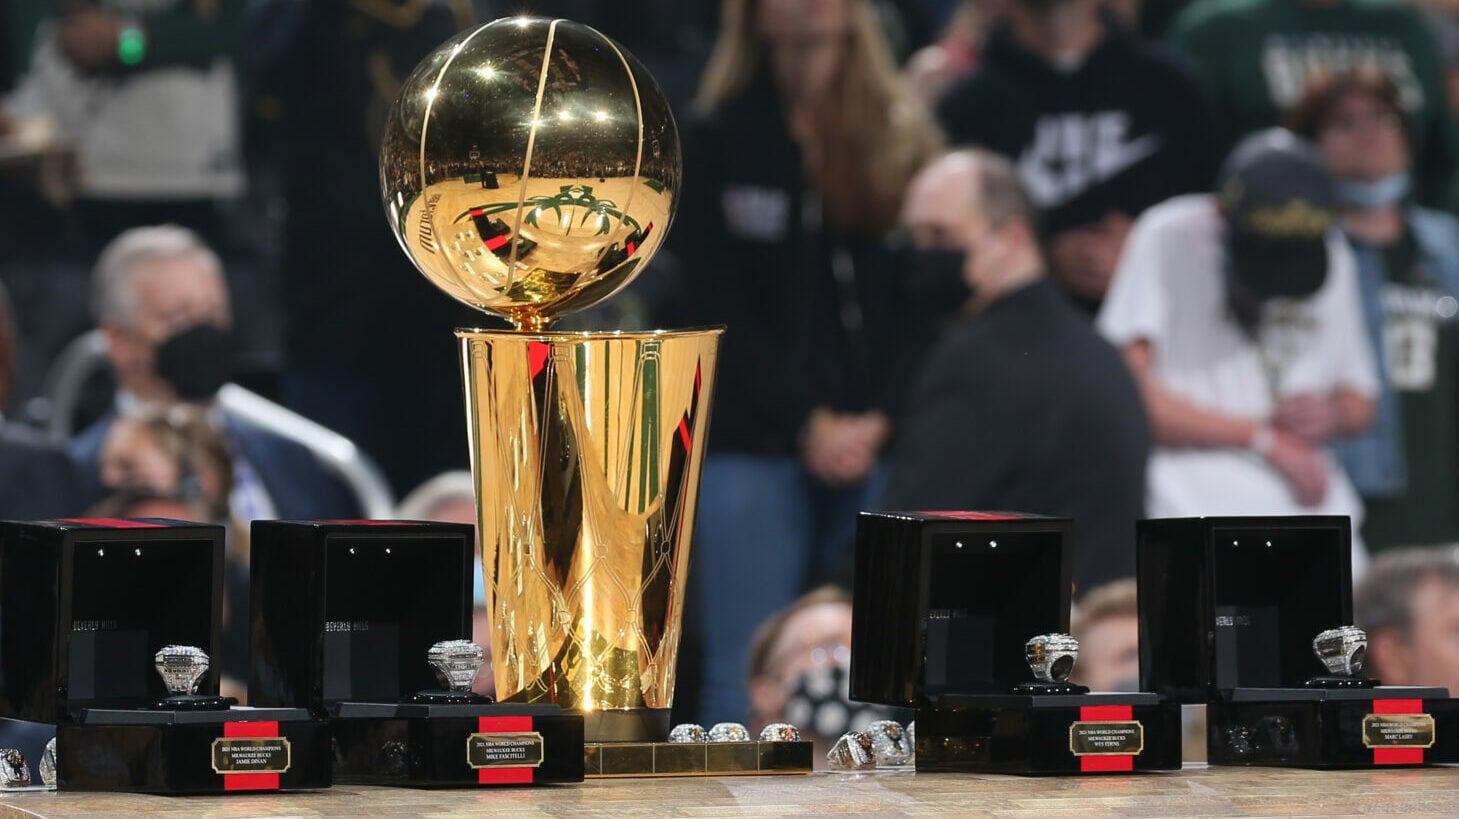 Bucks debut 2021 championship rings